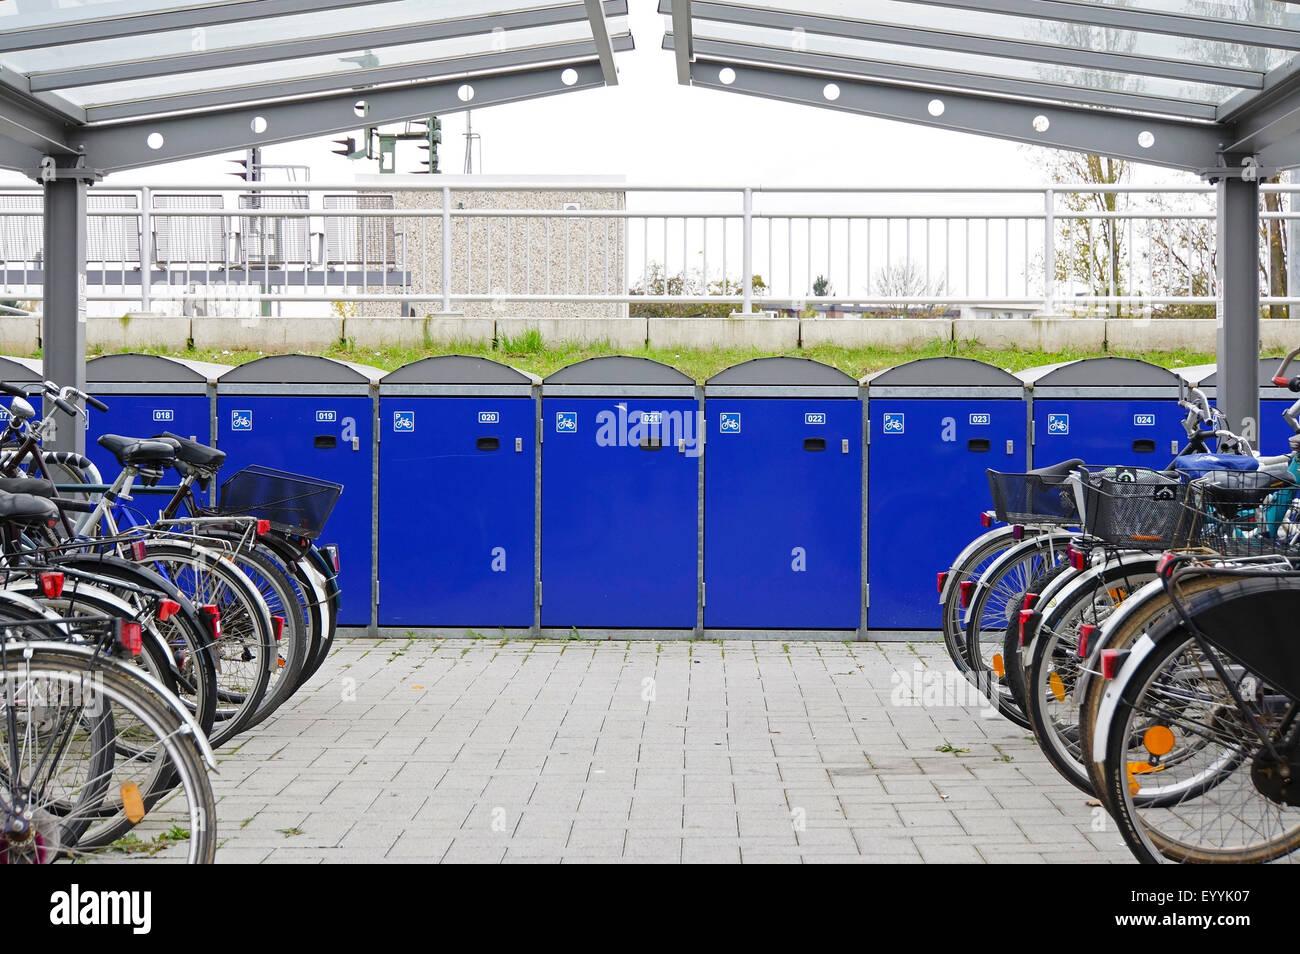 bicycle garage at the railway station, Germany, North Rhine-Westphalia, Euskirchen - Stock Image